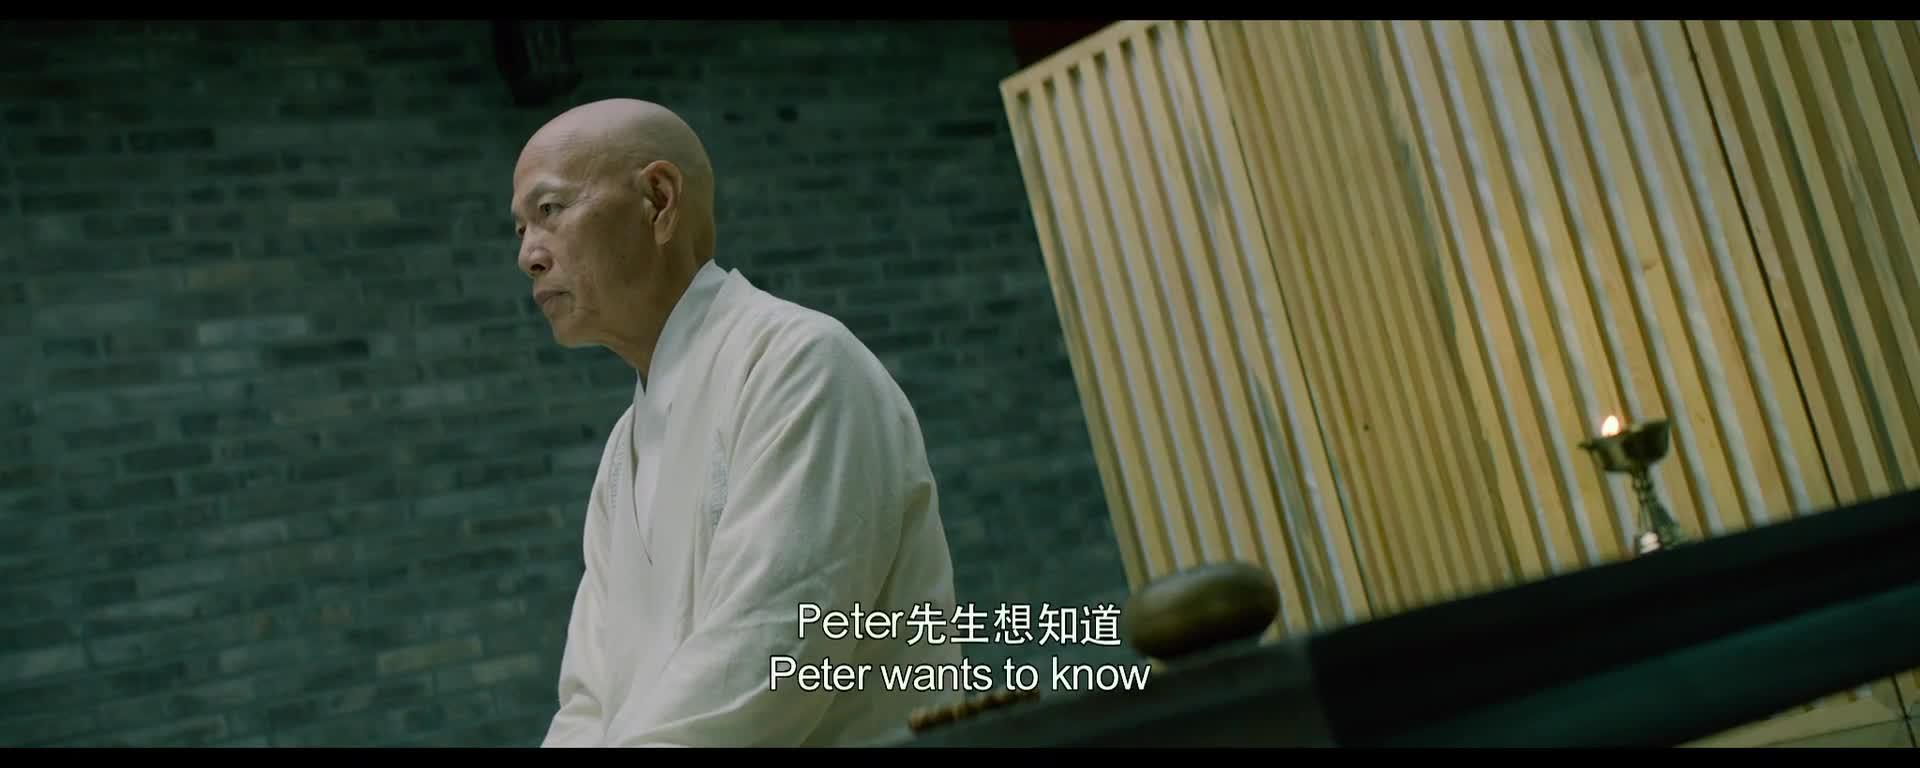 Peter身边站着一位年轻的女翻译,表示他是一位虔诚的基督徒